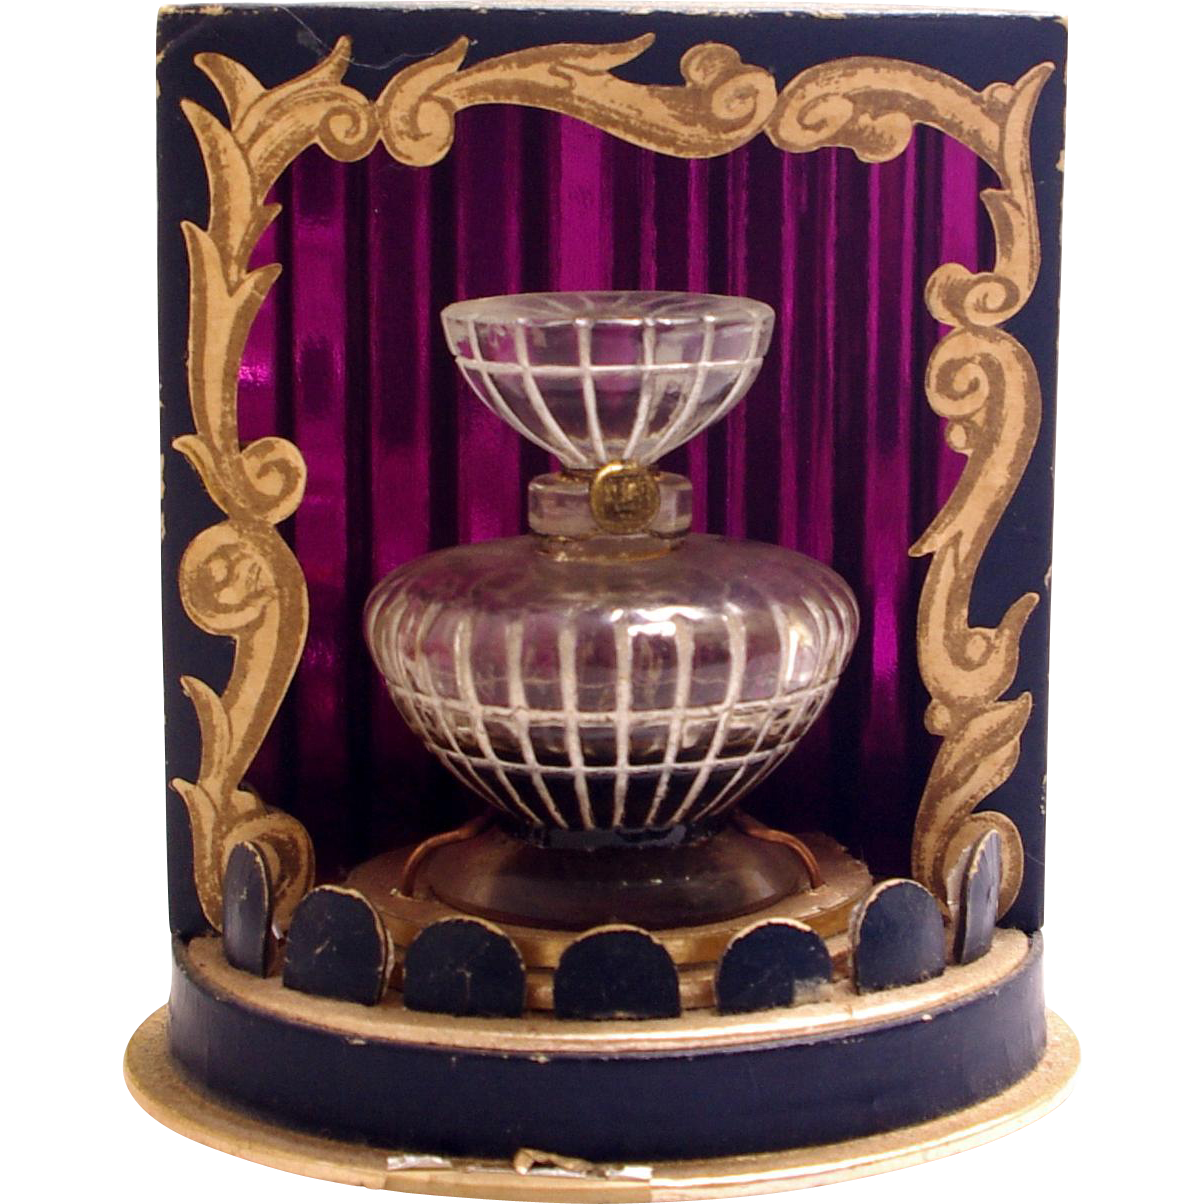 Vintage Commercial Perfume Bottle Lucien Lelong Opening Night From Augustseptemberantiques On Ruby Lane